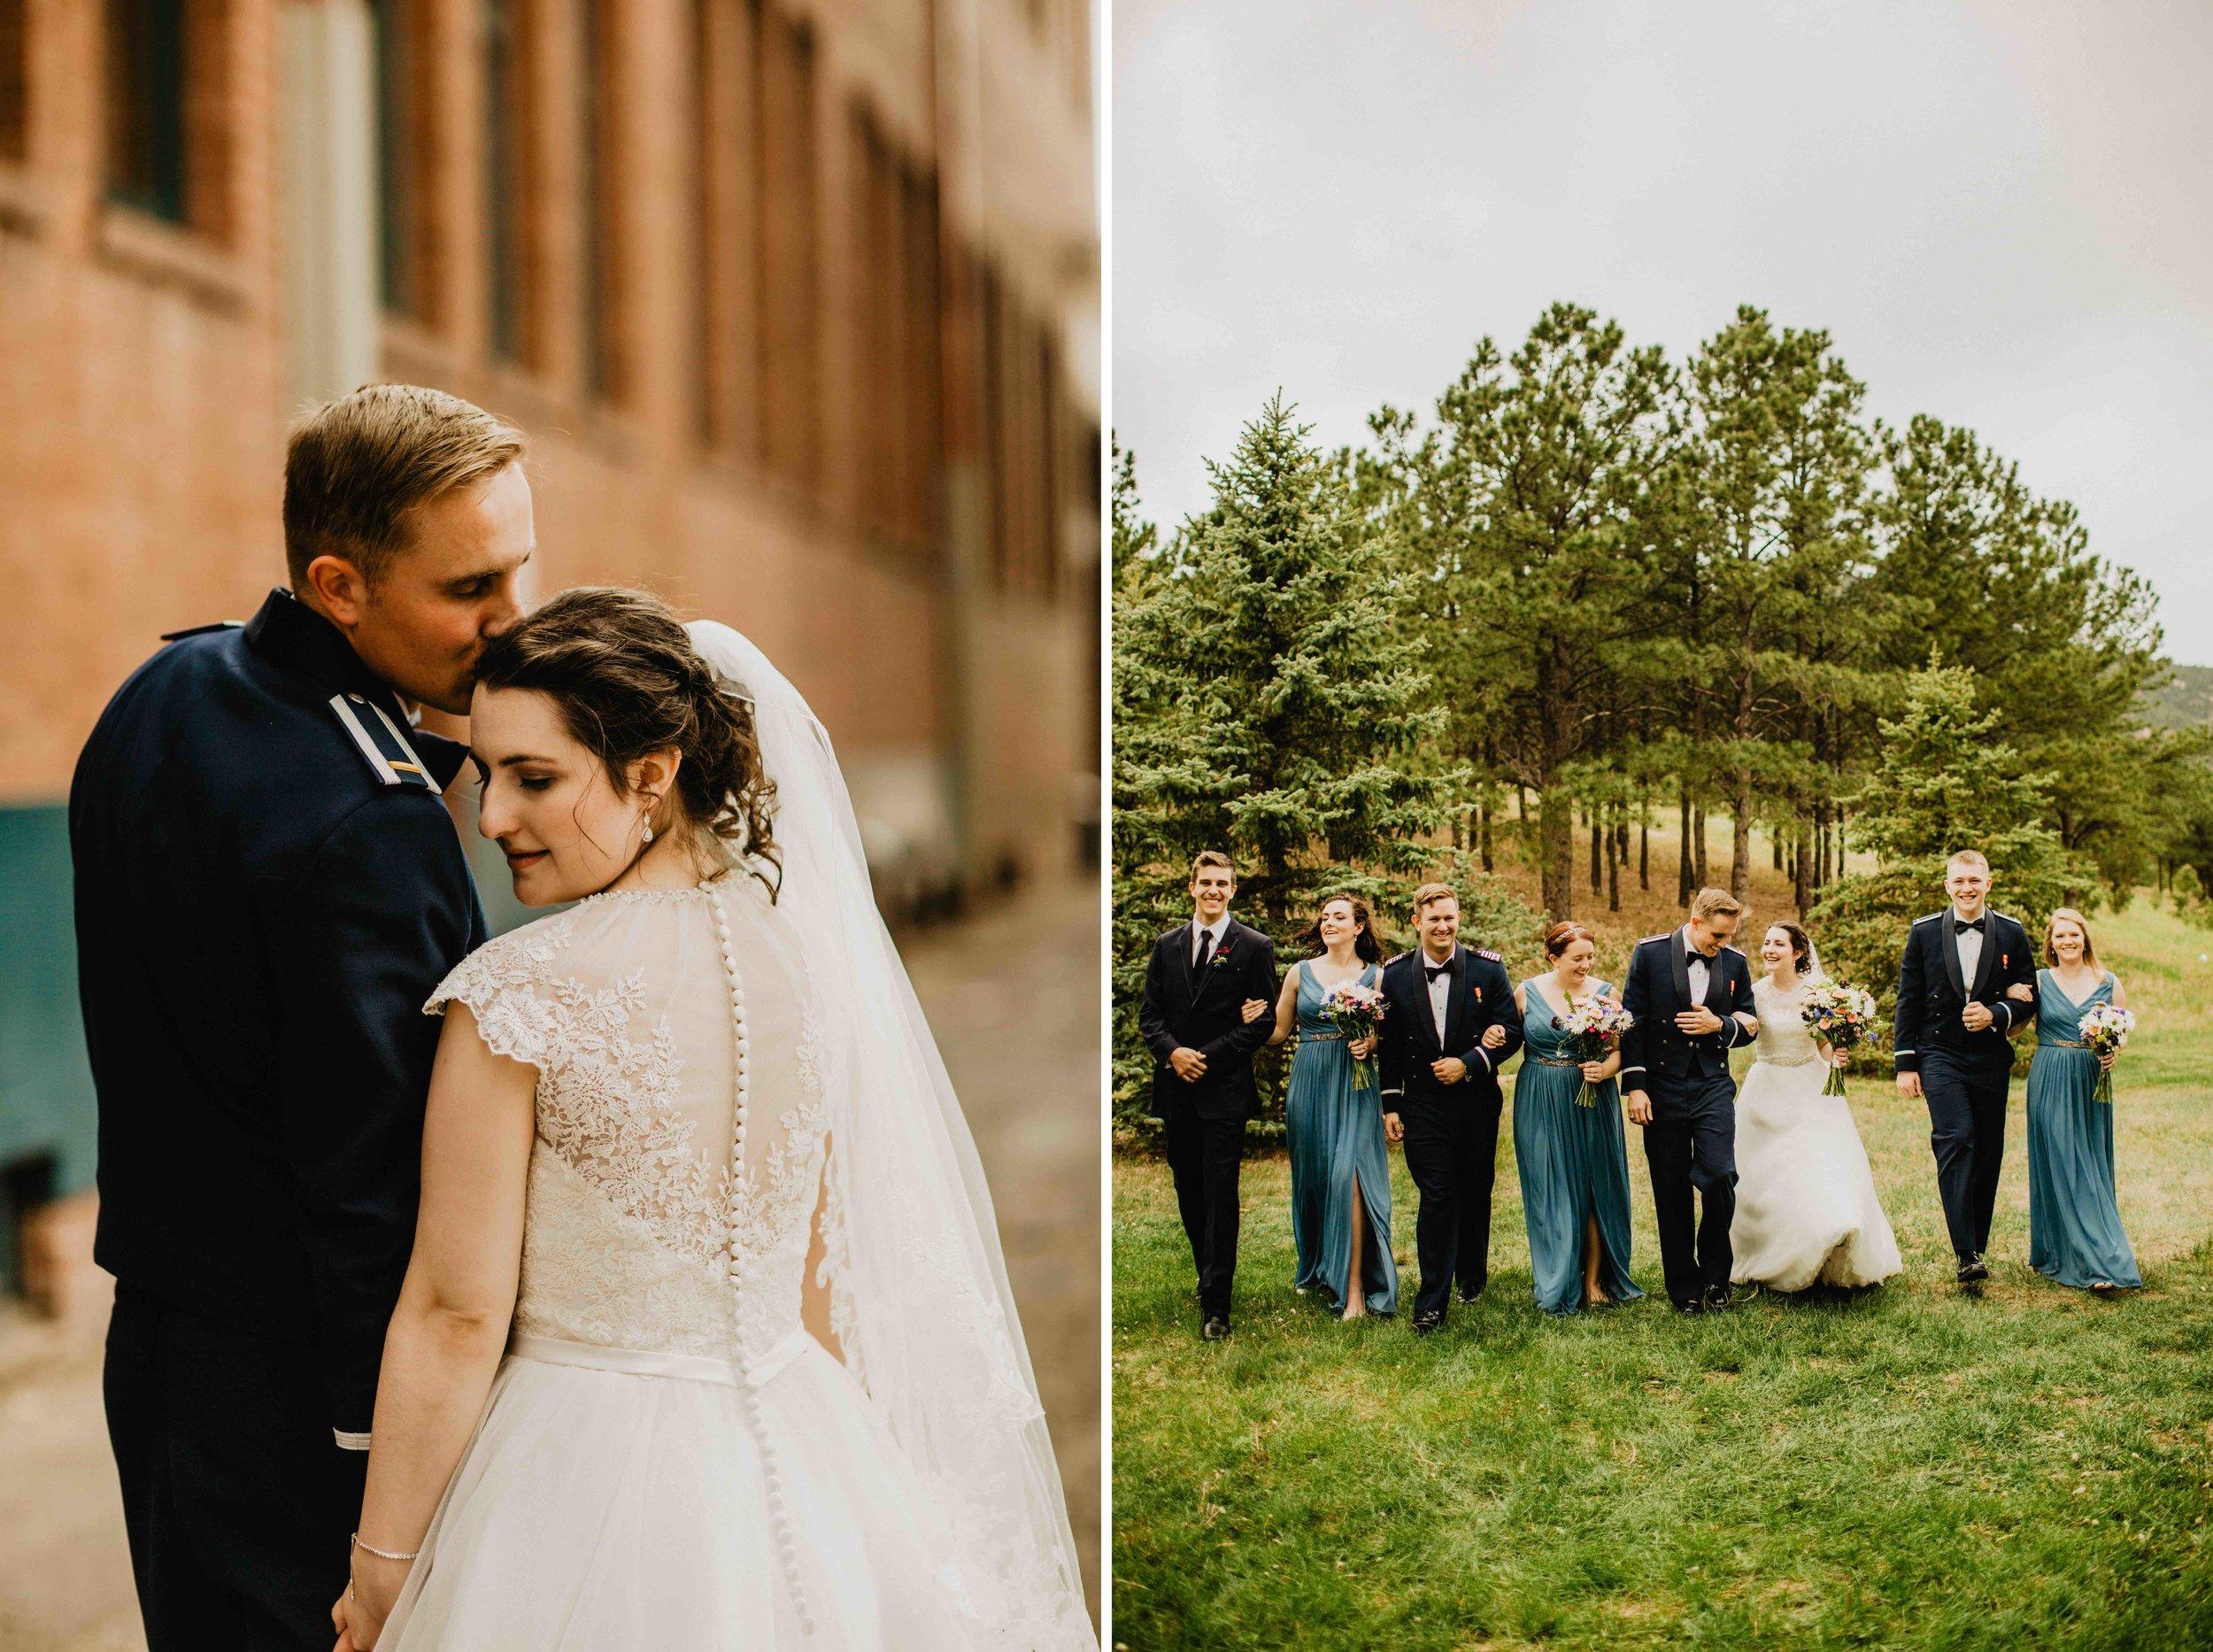 607A6166-colorado-wedding-photographer-denver-springs-vail--colorado-wedding-photographer-denver-springs-vail-.jpeg